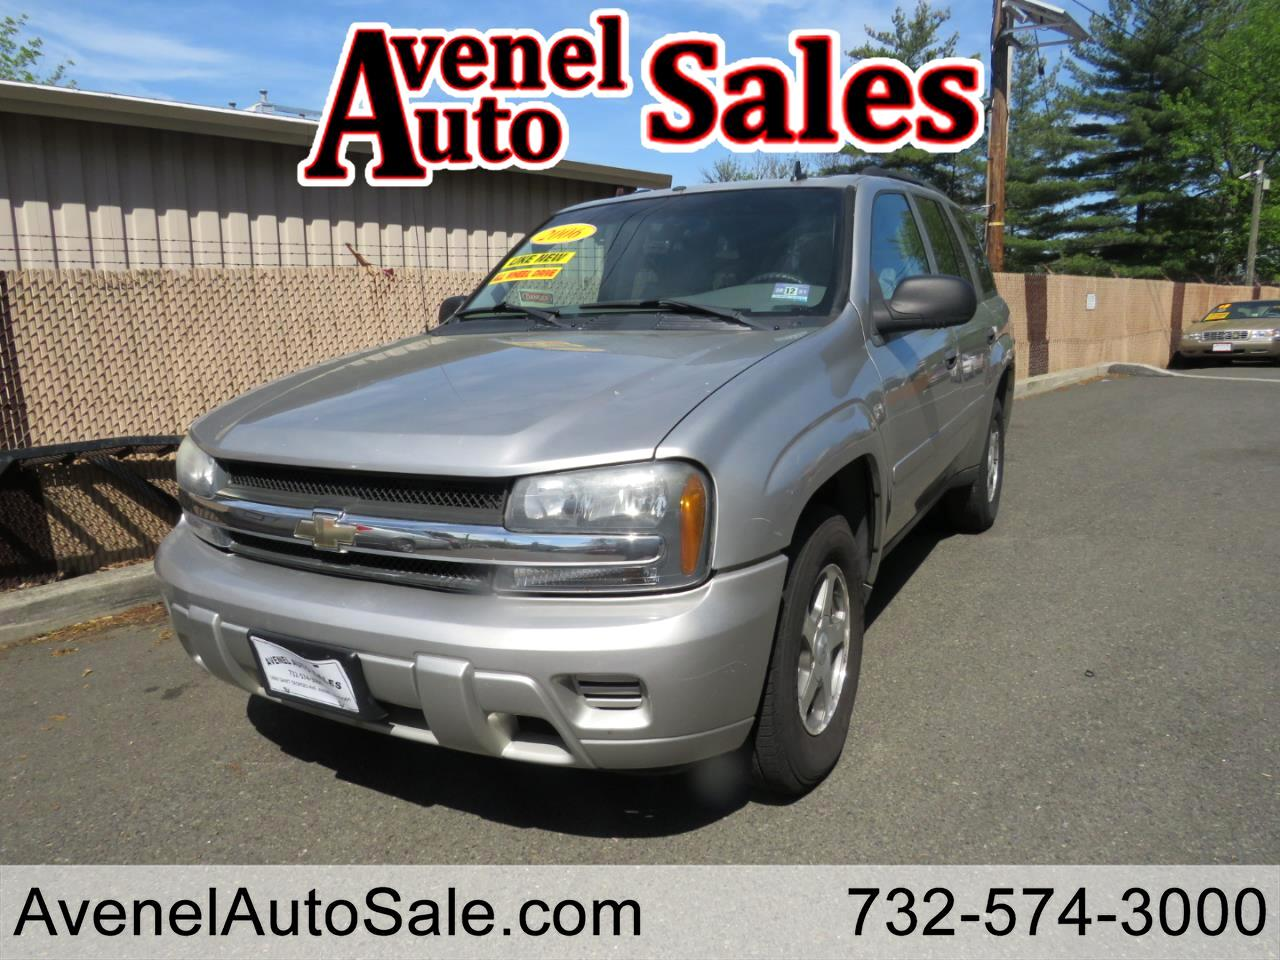 Chevrolet TrailBlazer LS 4WD 2006